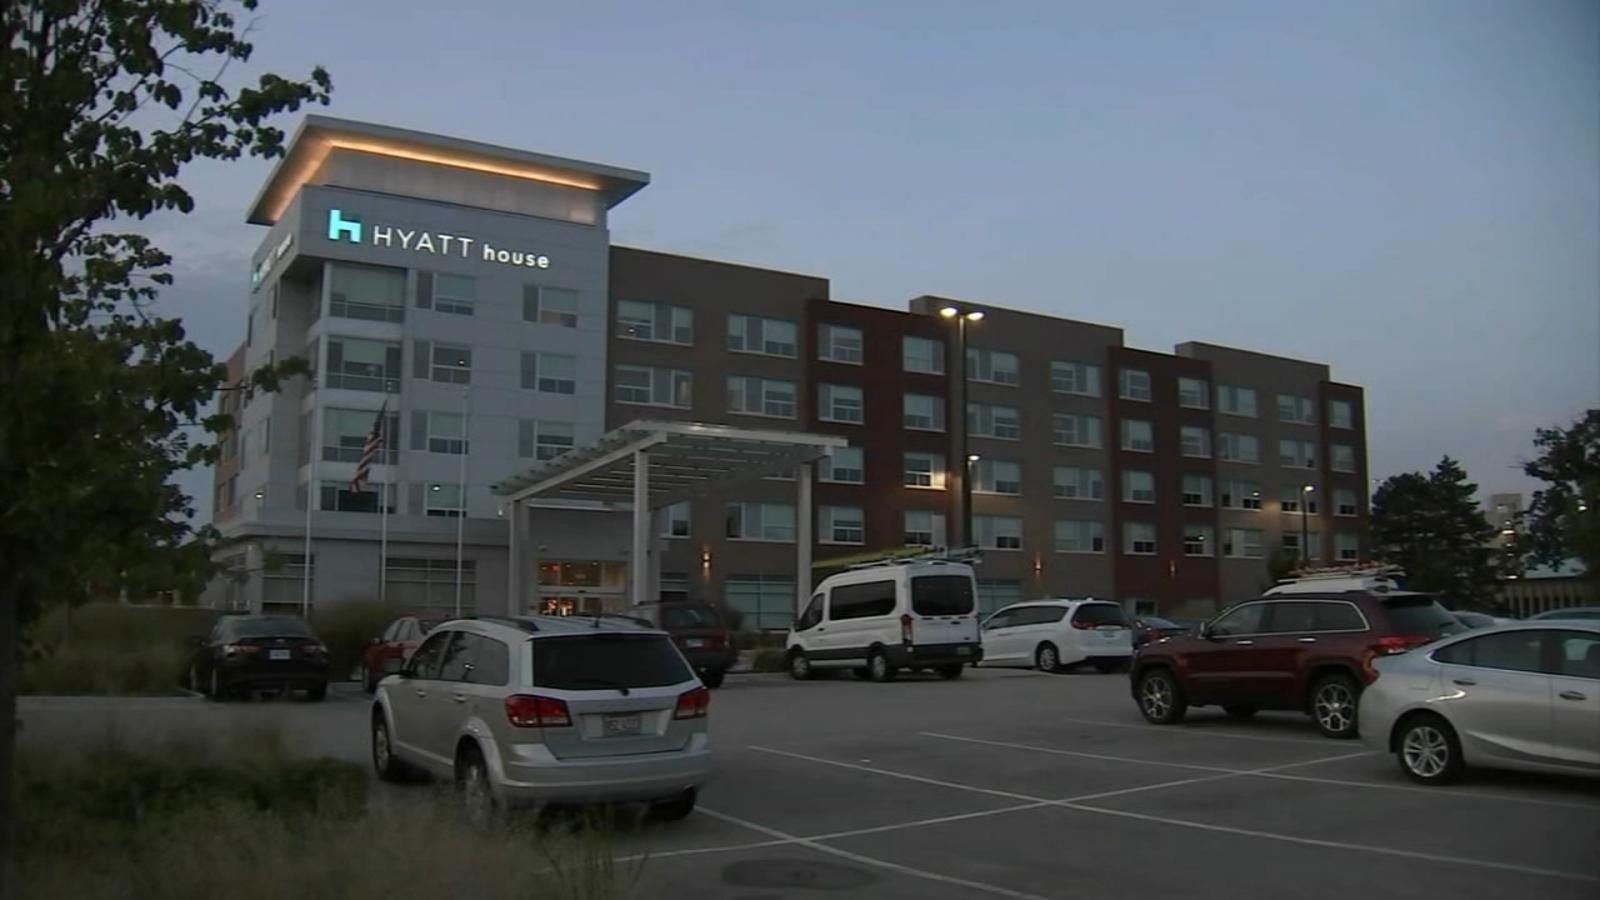 20-letnia pracownica hotelu w Oak Brook zaatakowana na tle seksualnym